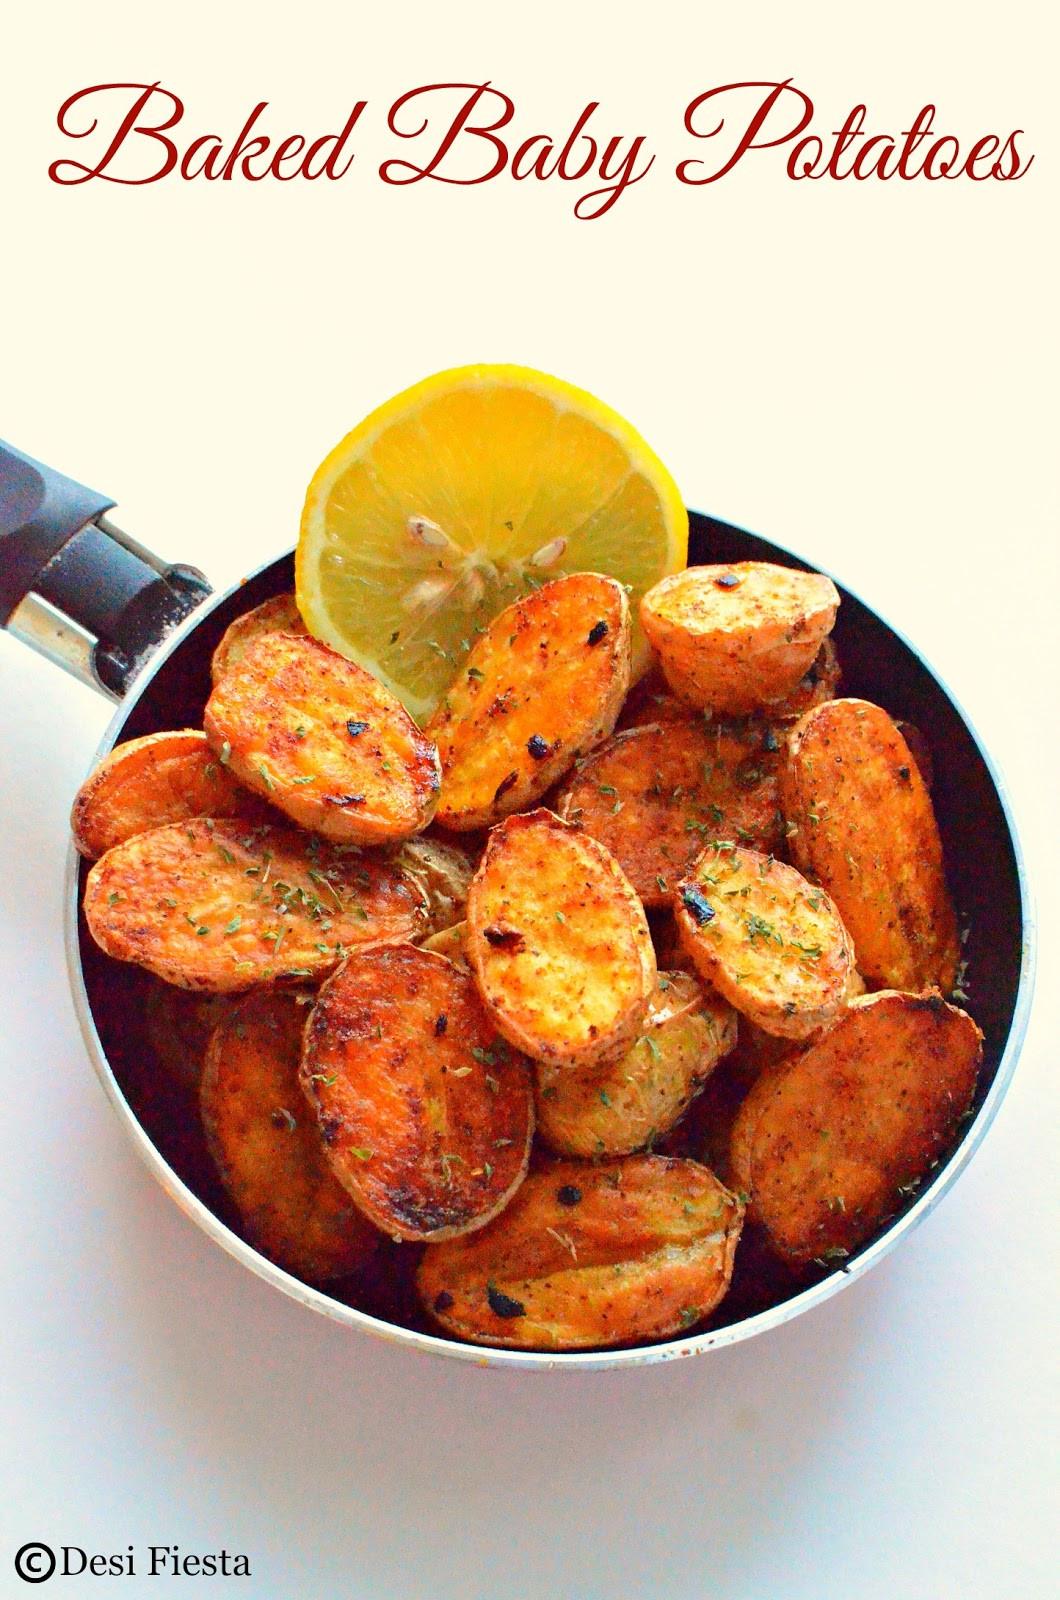 Oven Roasted Baby Potatoes  Desi Fiesta Baked Baby Potatoes Recipe